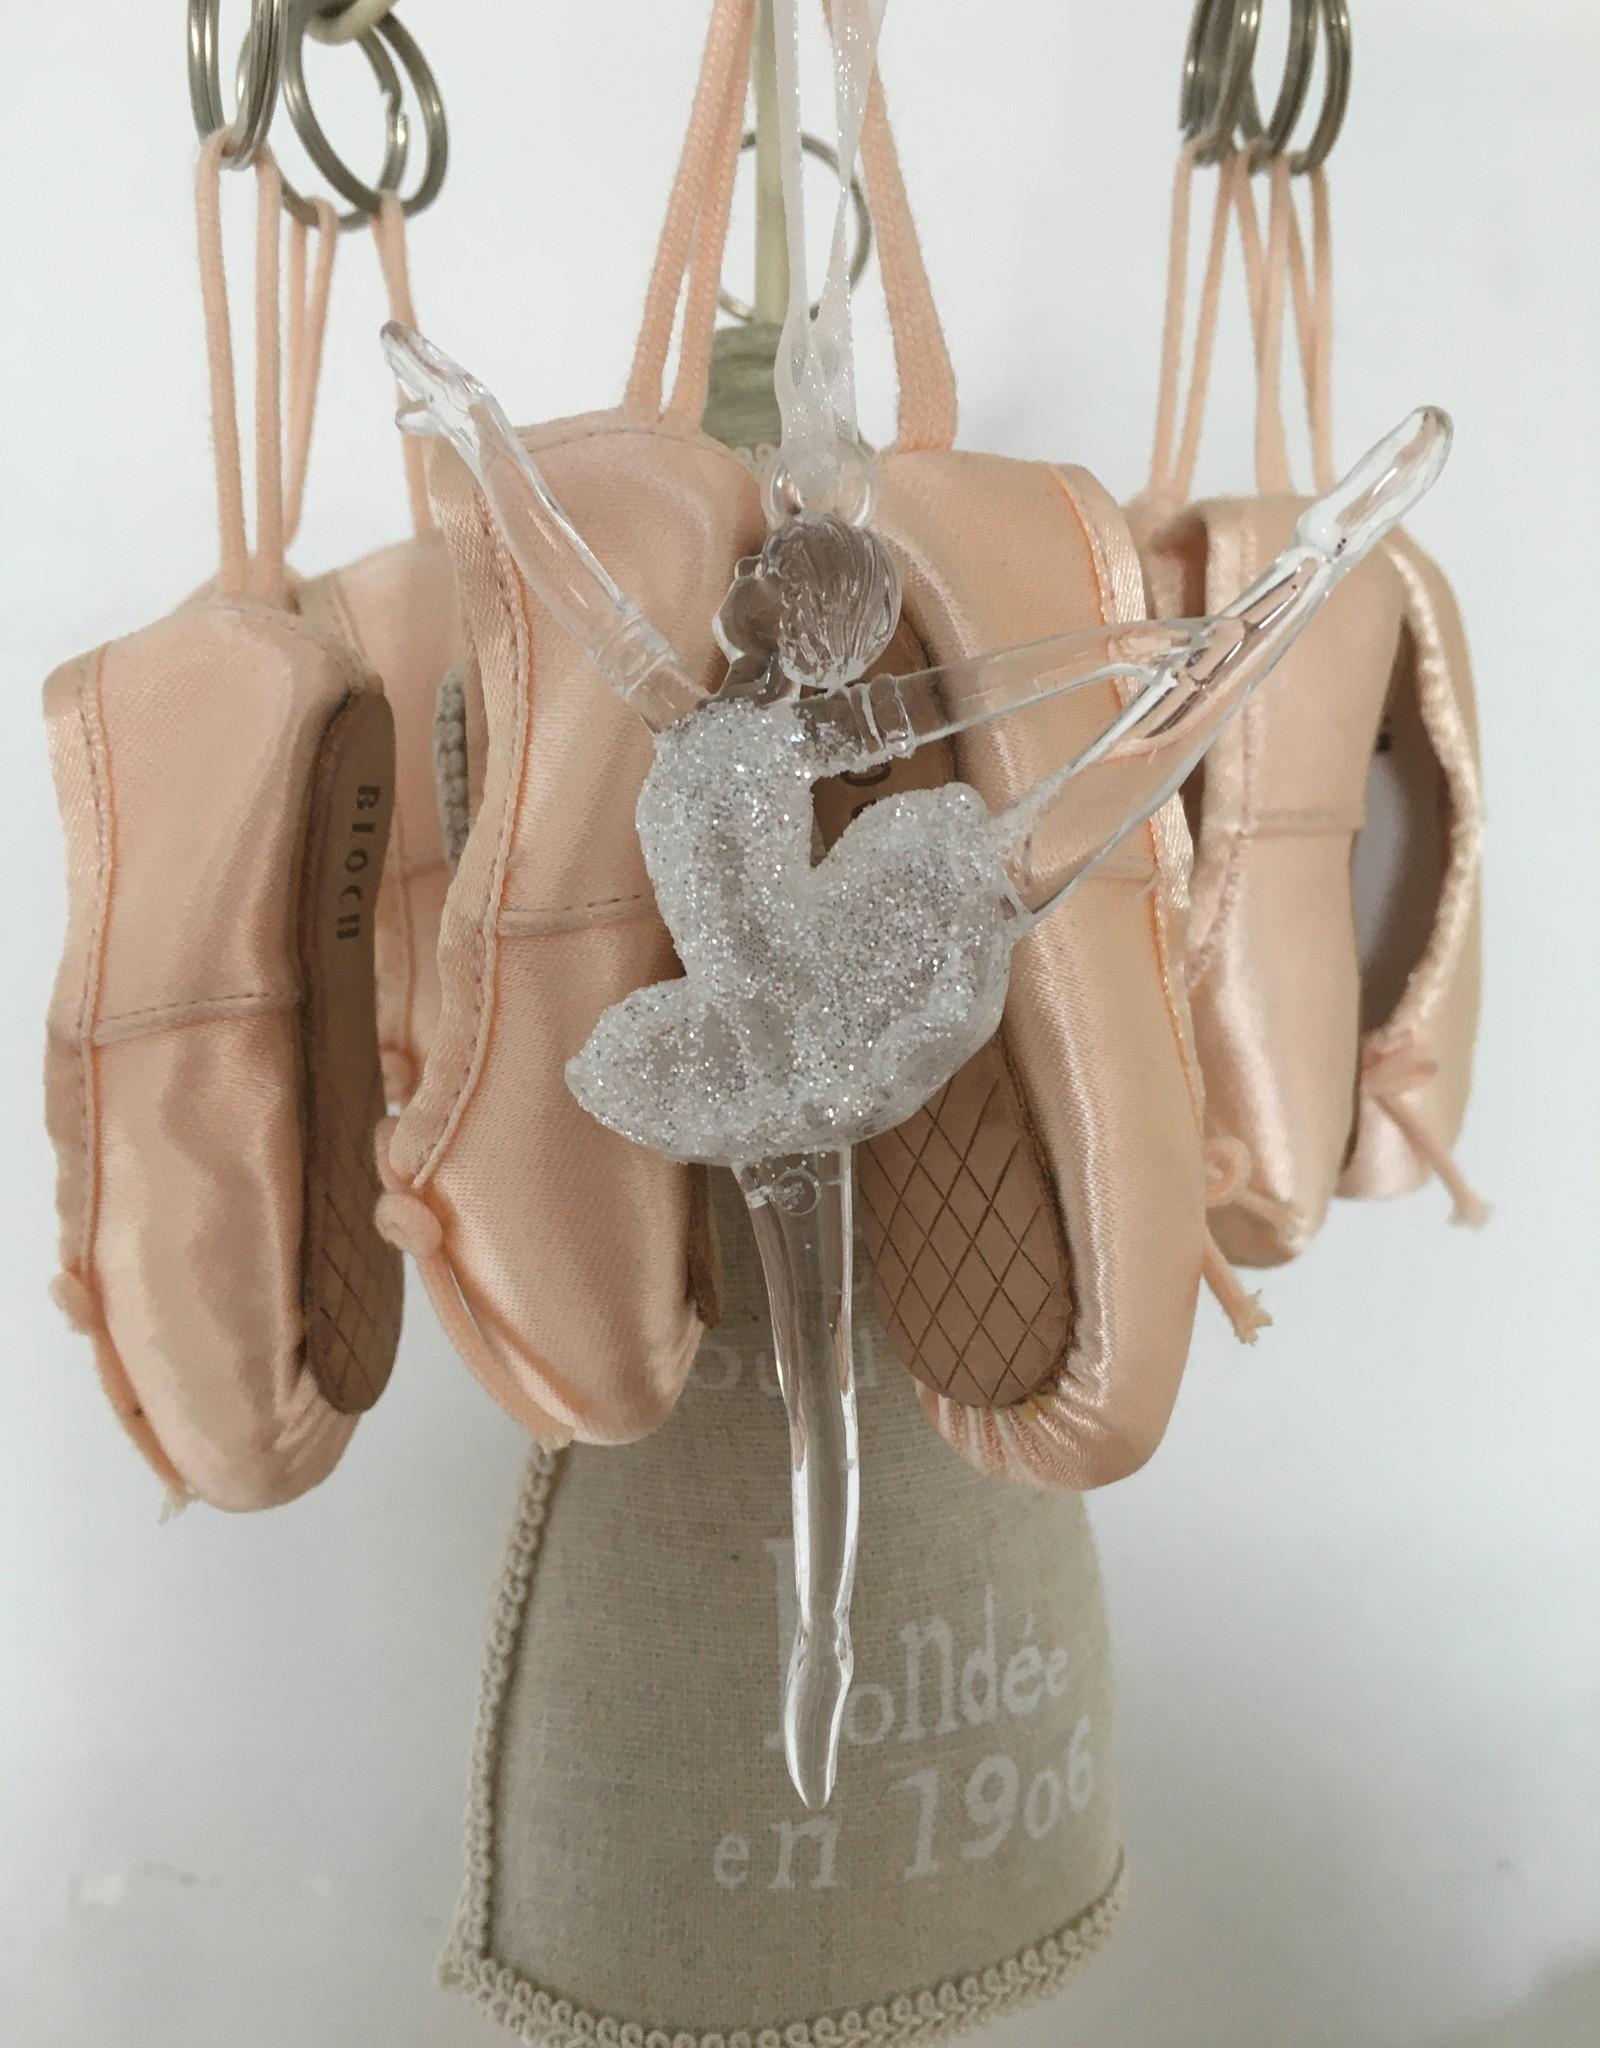 Goodwill Ballerina hangertje arabesque